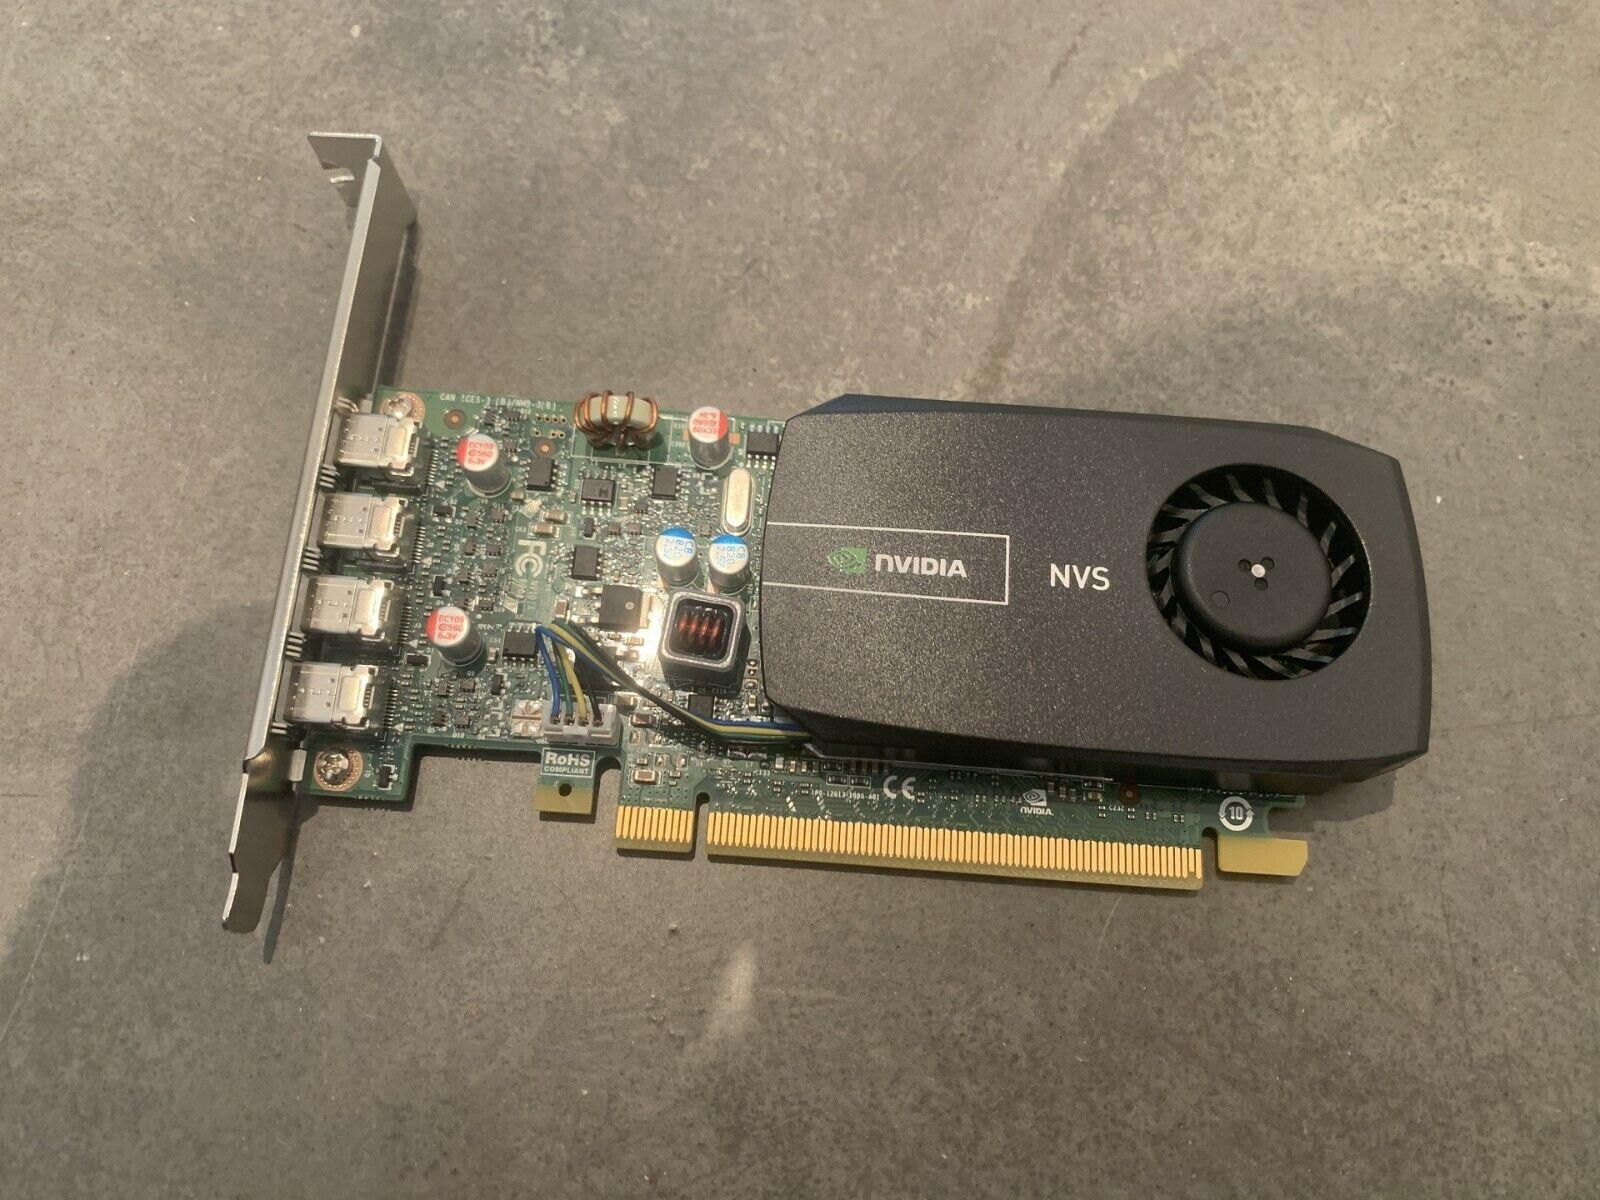 NVidia NVS510 2GB Grafikkarte 4x Mini DP 00FC861 4K incl Adapter Standard Profil